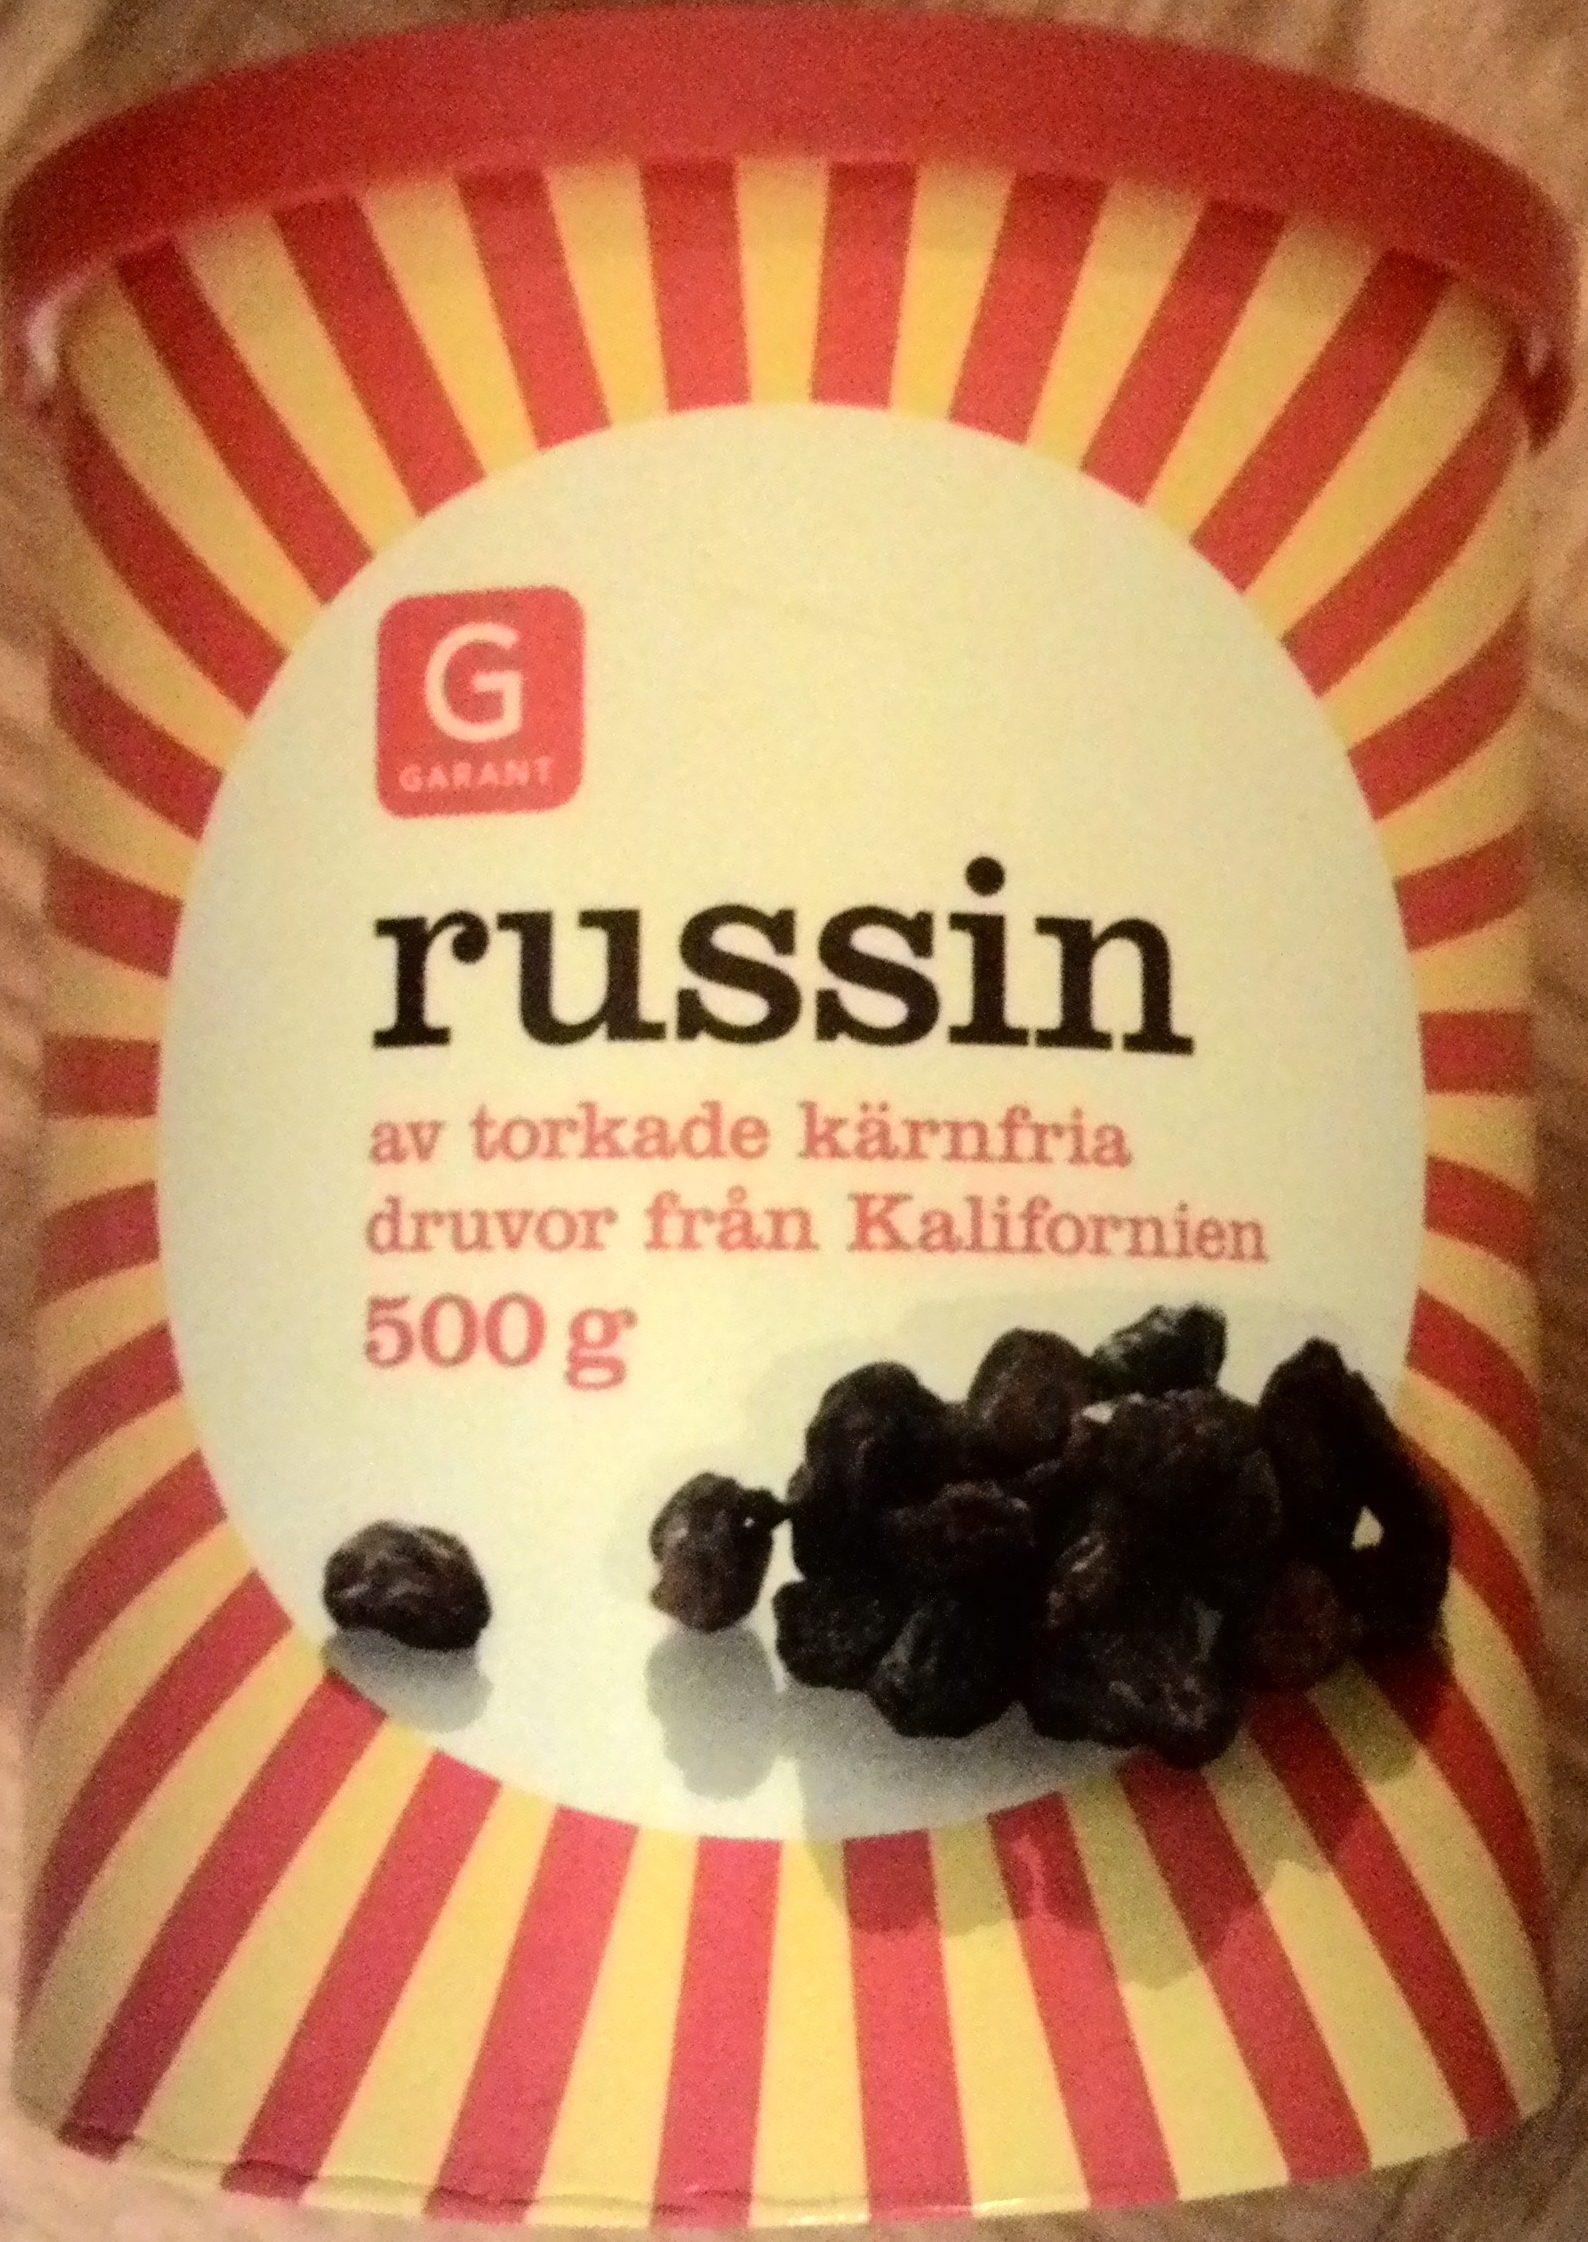 Garant Russin - Produit - sv